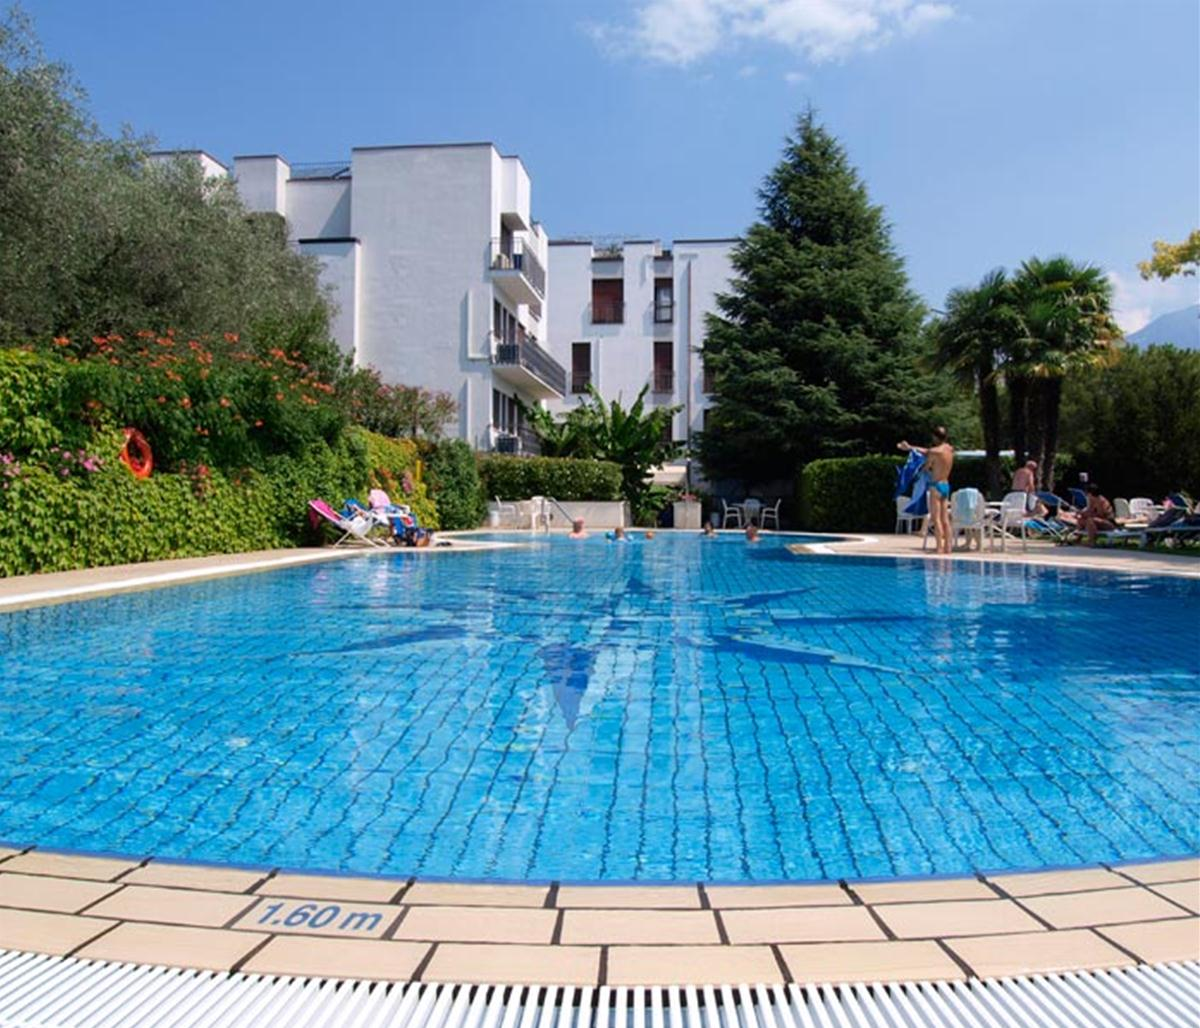 Bristol Hotel - Riva del Garda